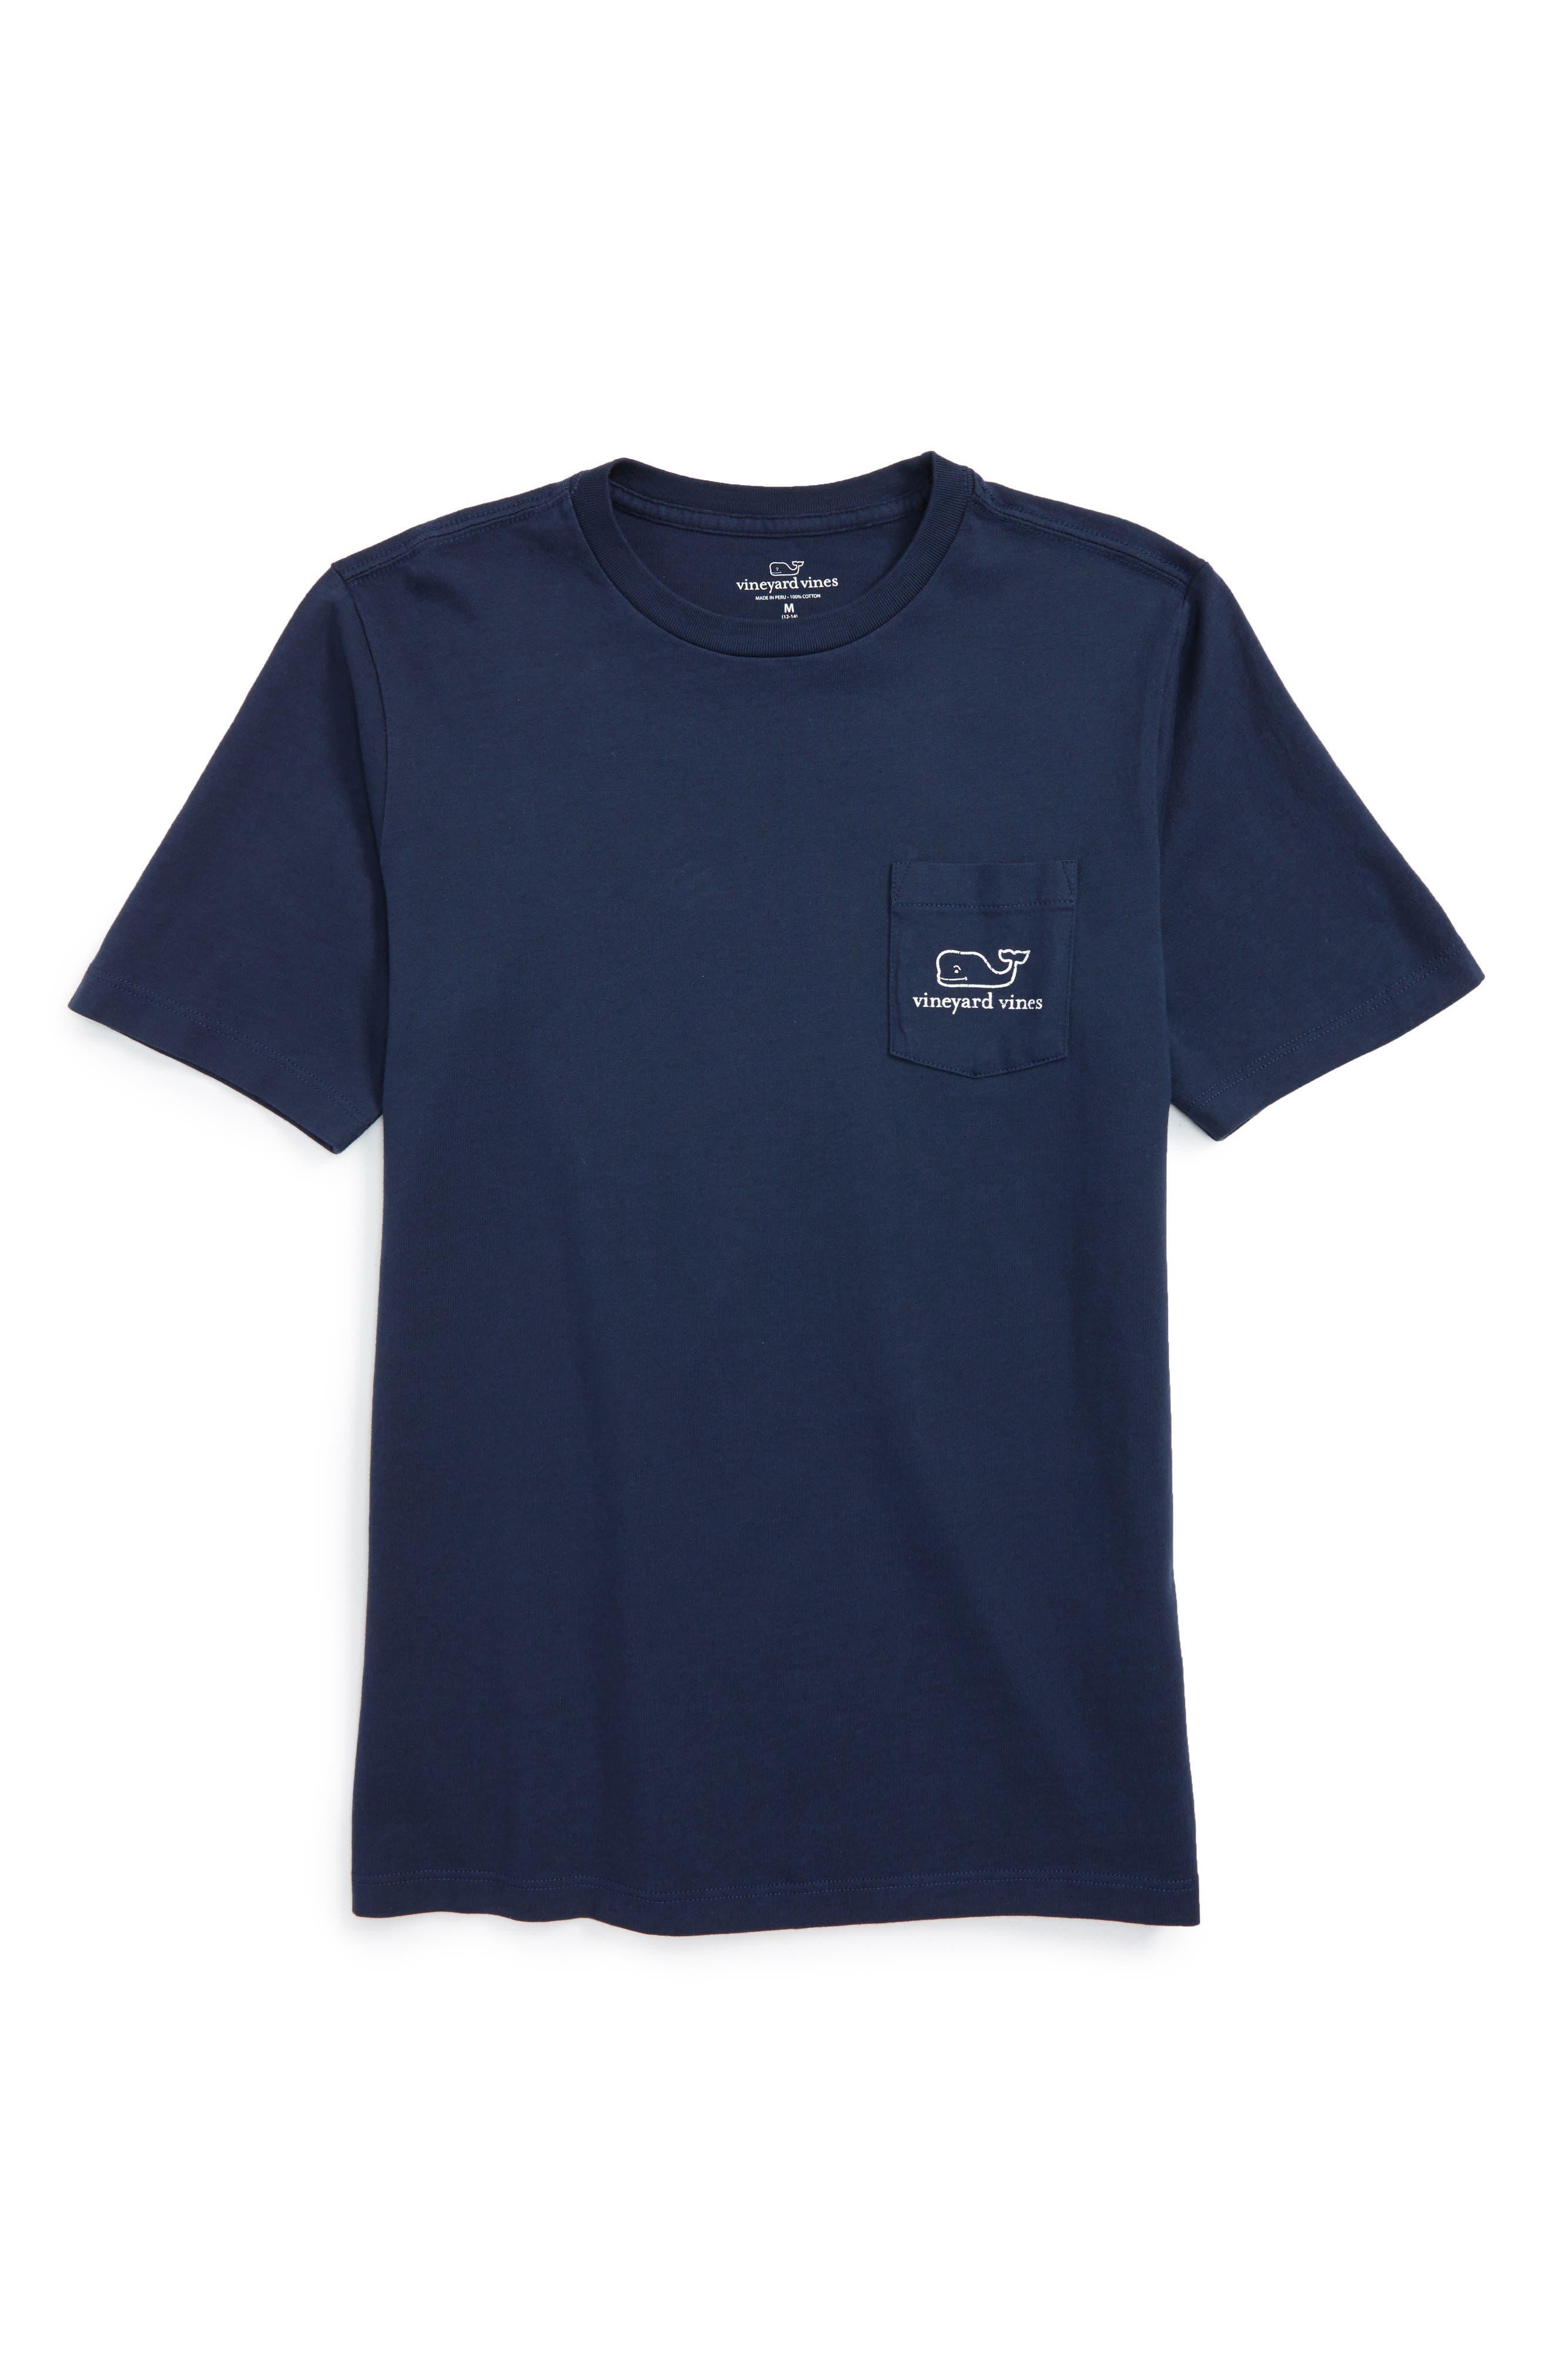 Main Image - vineyard vines Vintage Whale Pocket T-Shirt (Toddler Boys & Little Boys)